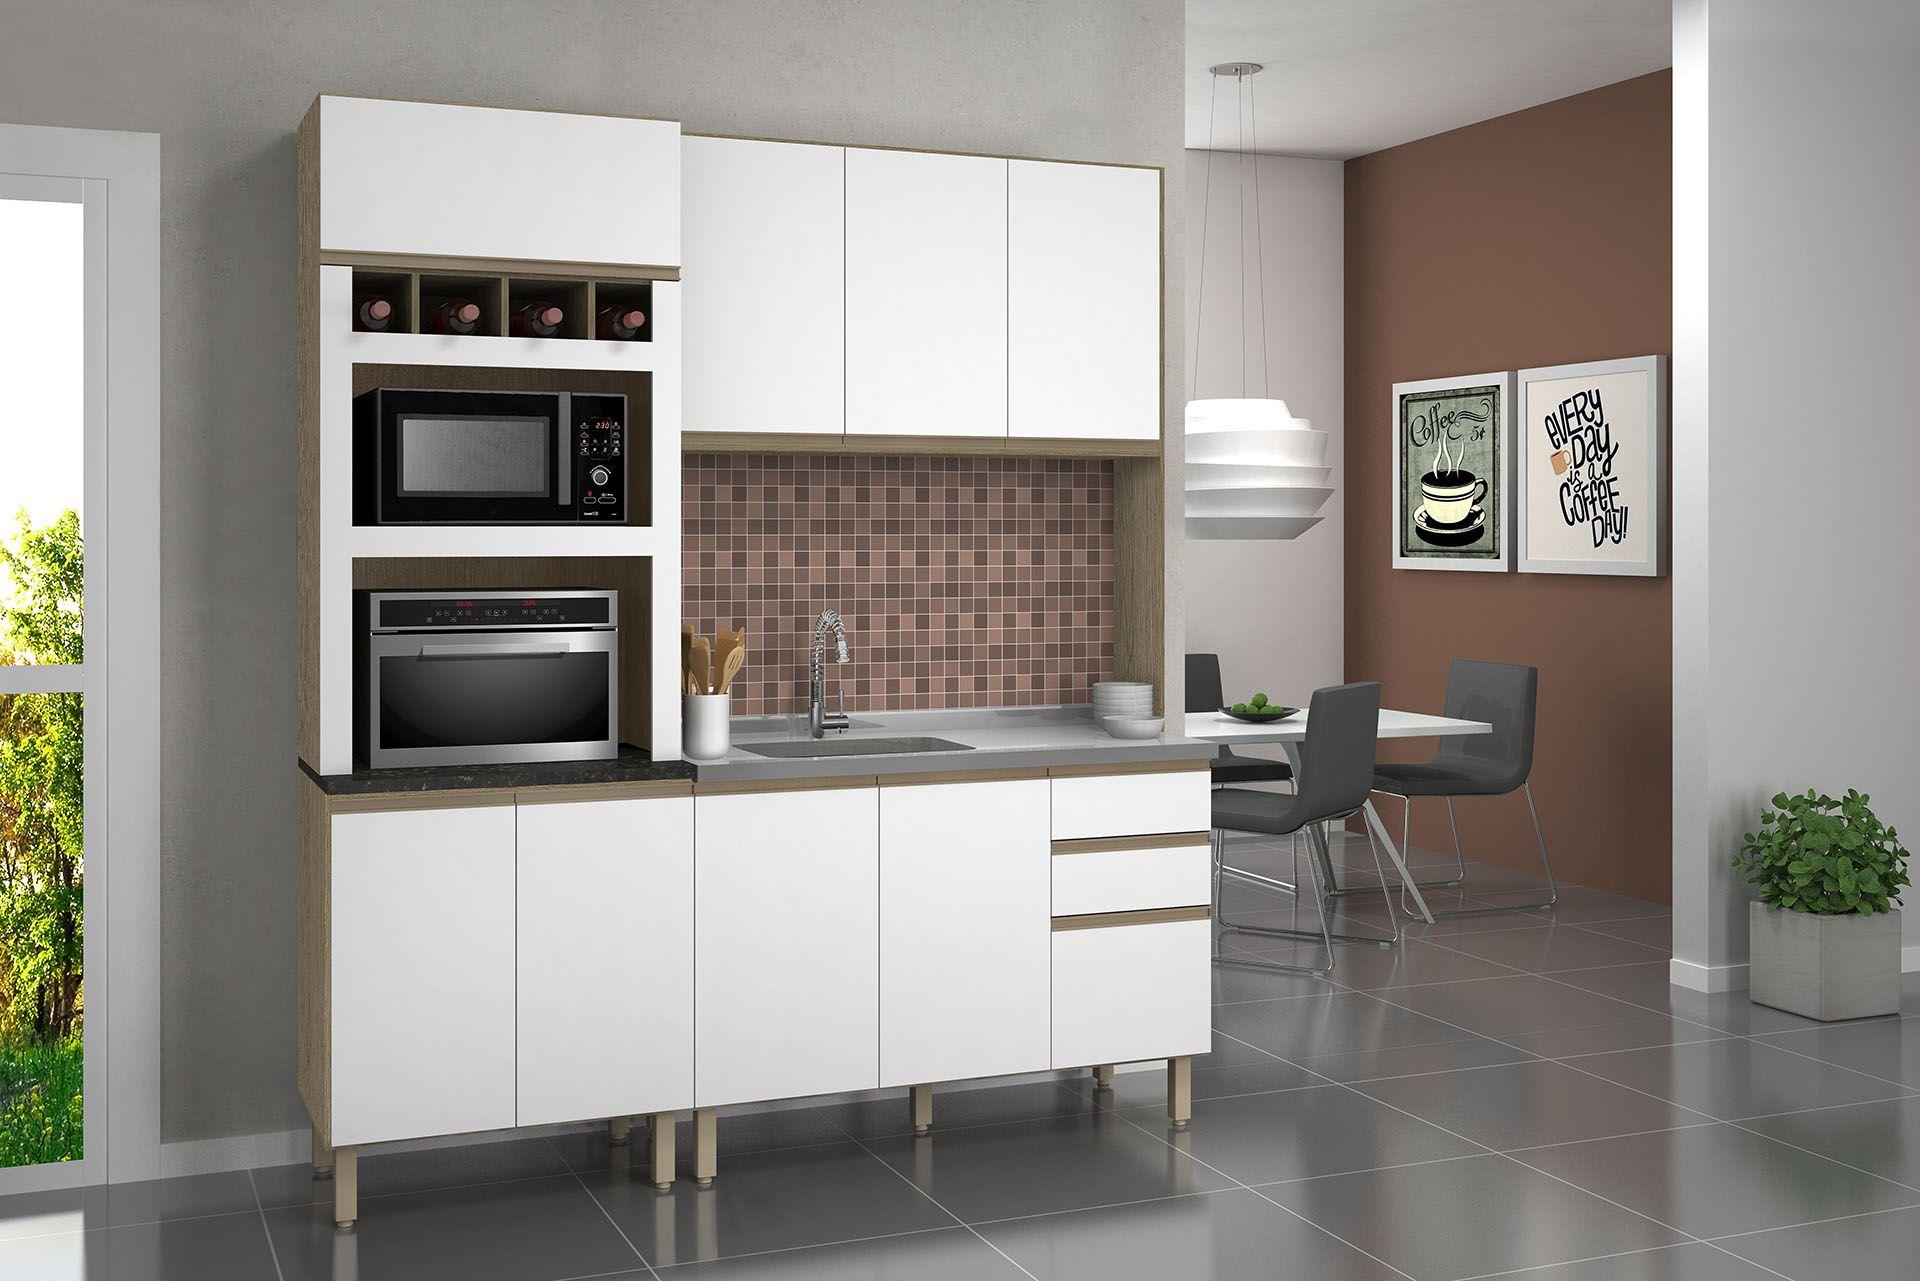 Cozinha Compacta Sis Premium 100 Mdf Nicioli Jolear M Veis